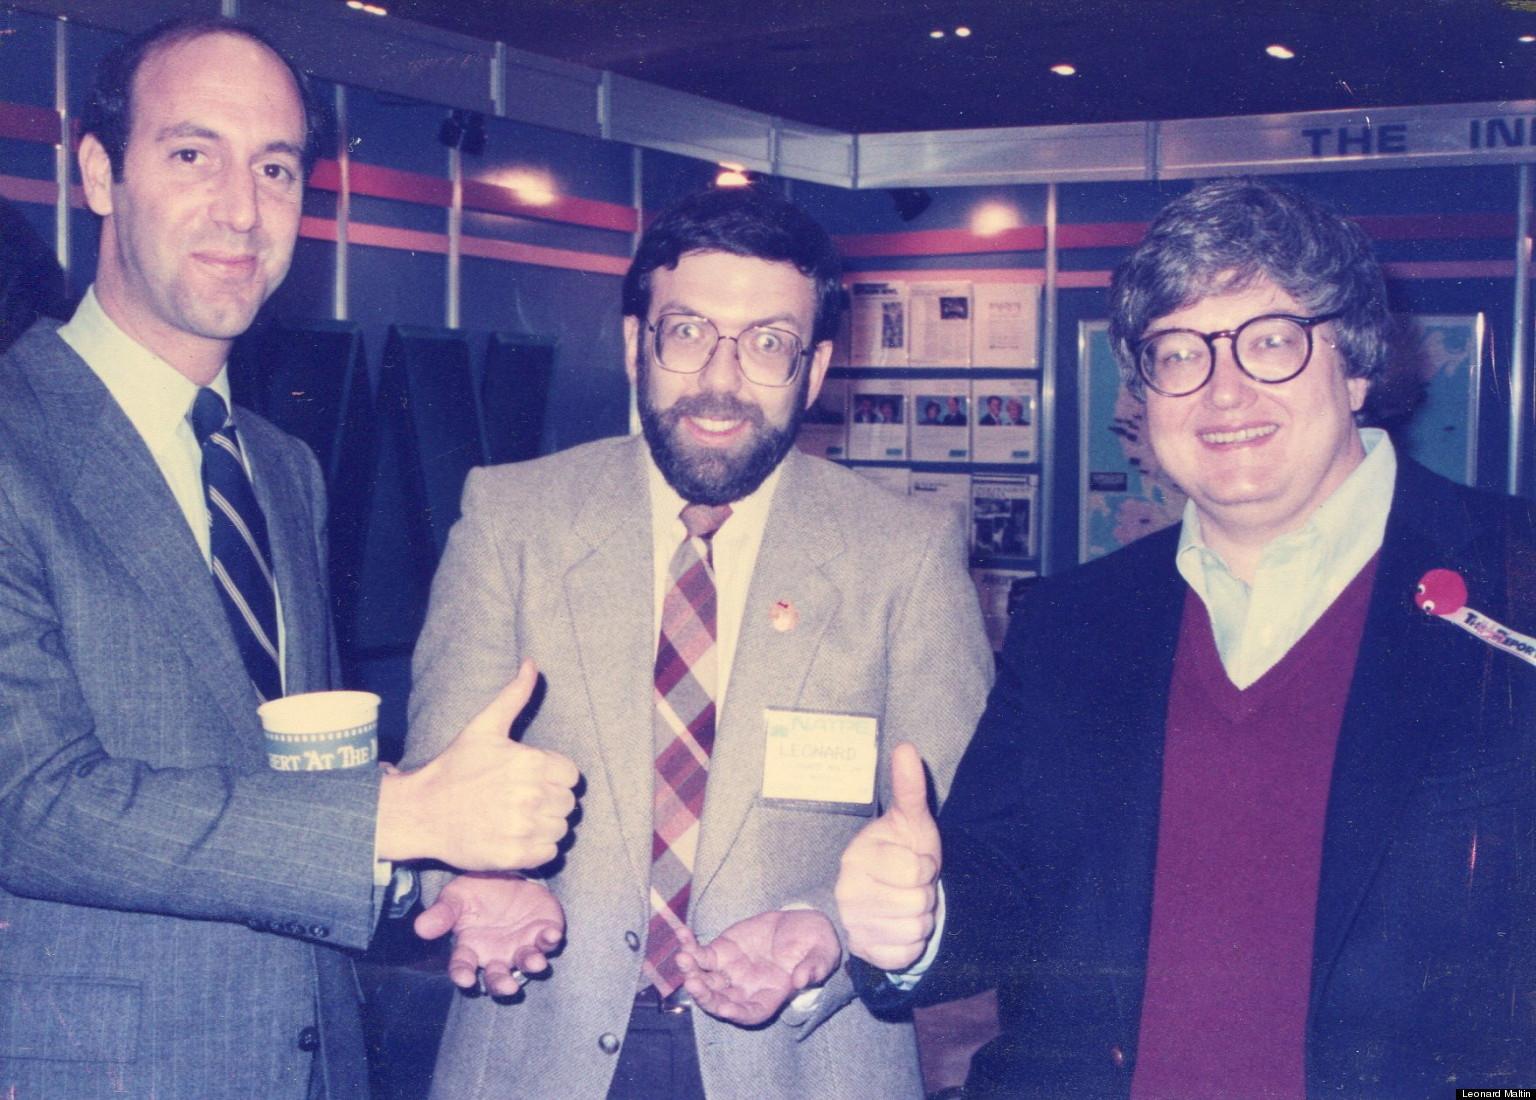 Roger Ebert More Than Just a Critic  HuffPost